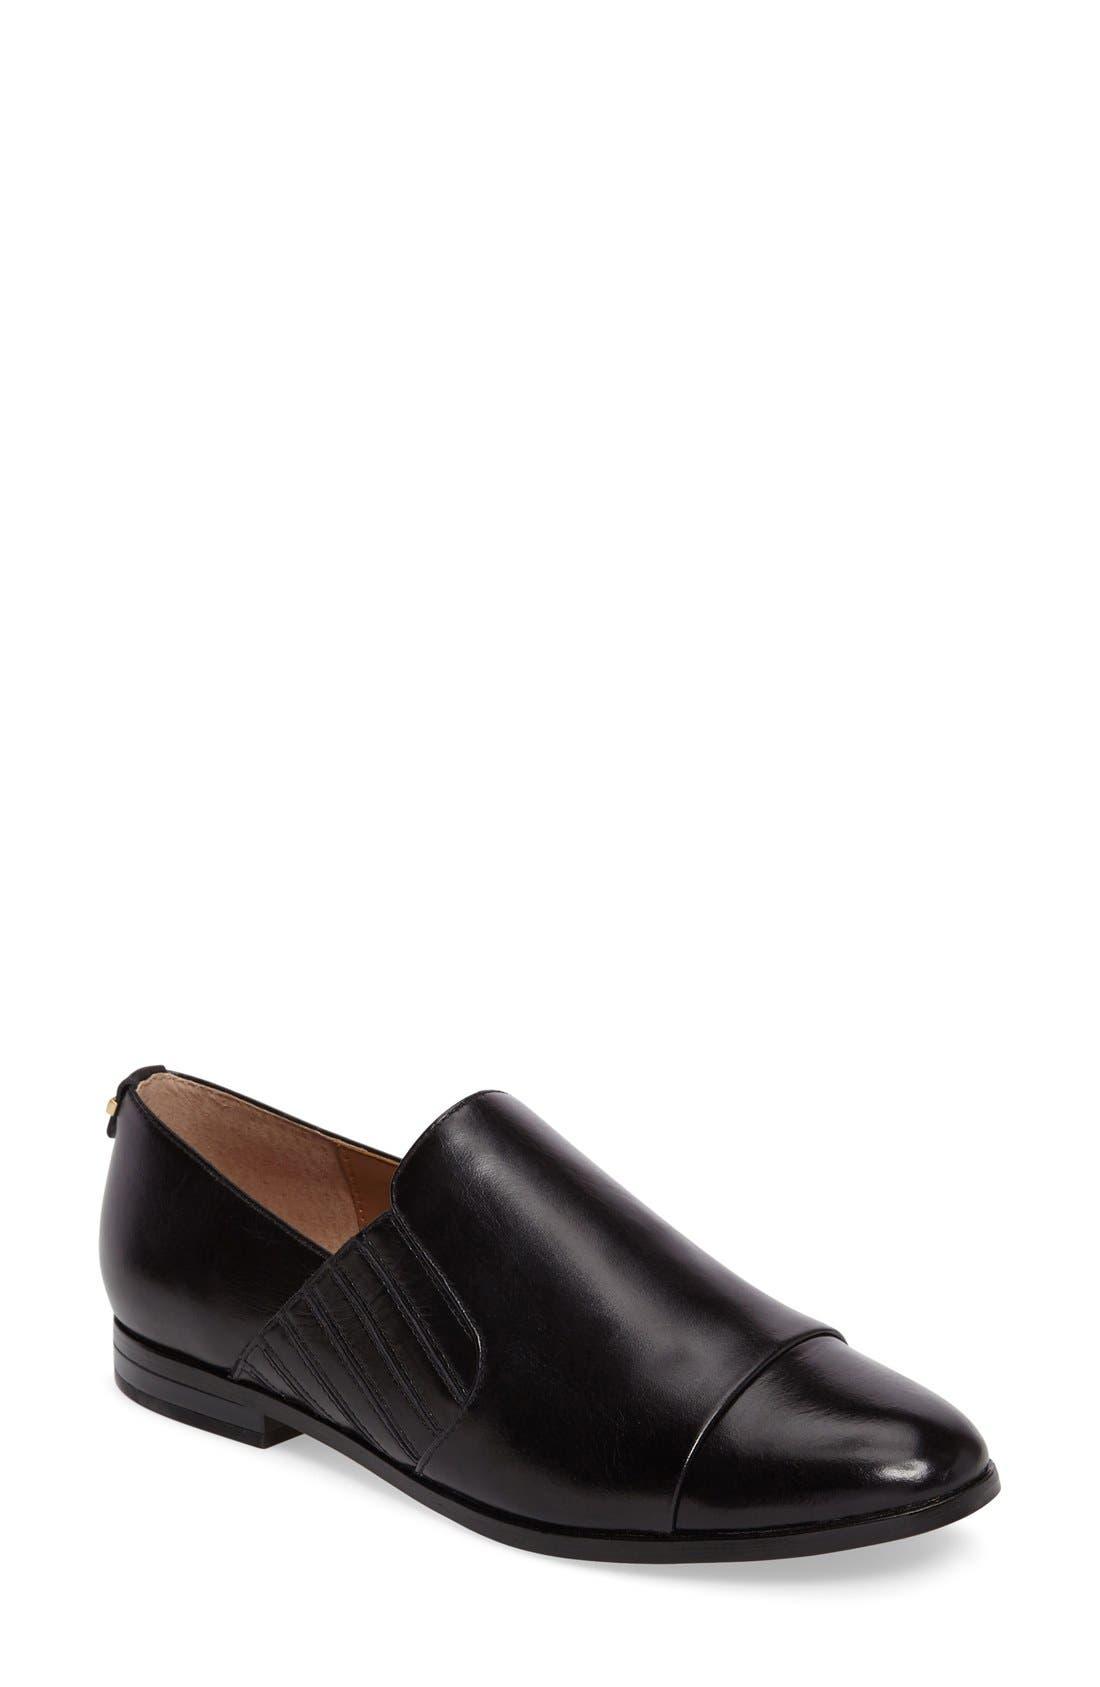 Main Image - Calvin Klein Cella Slip-On Loafer (Women)